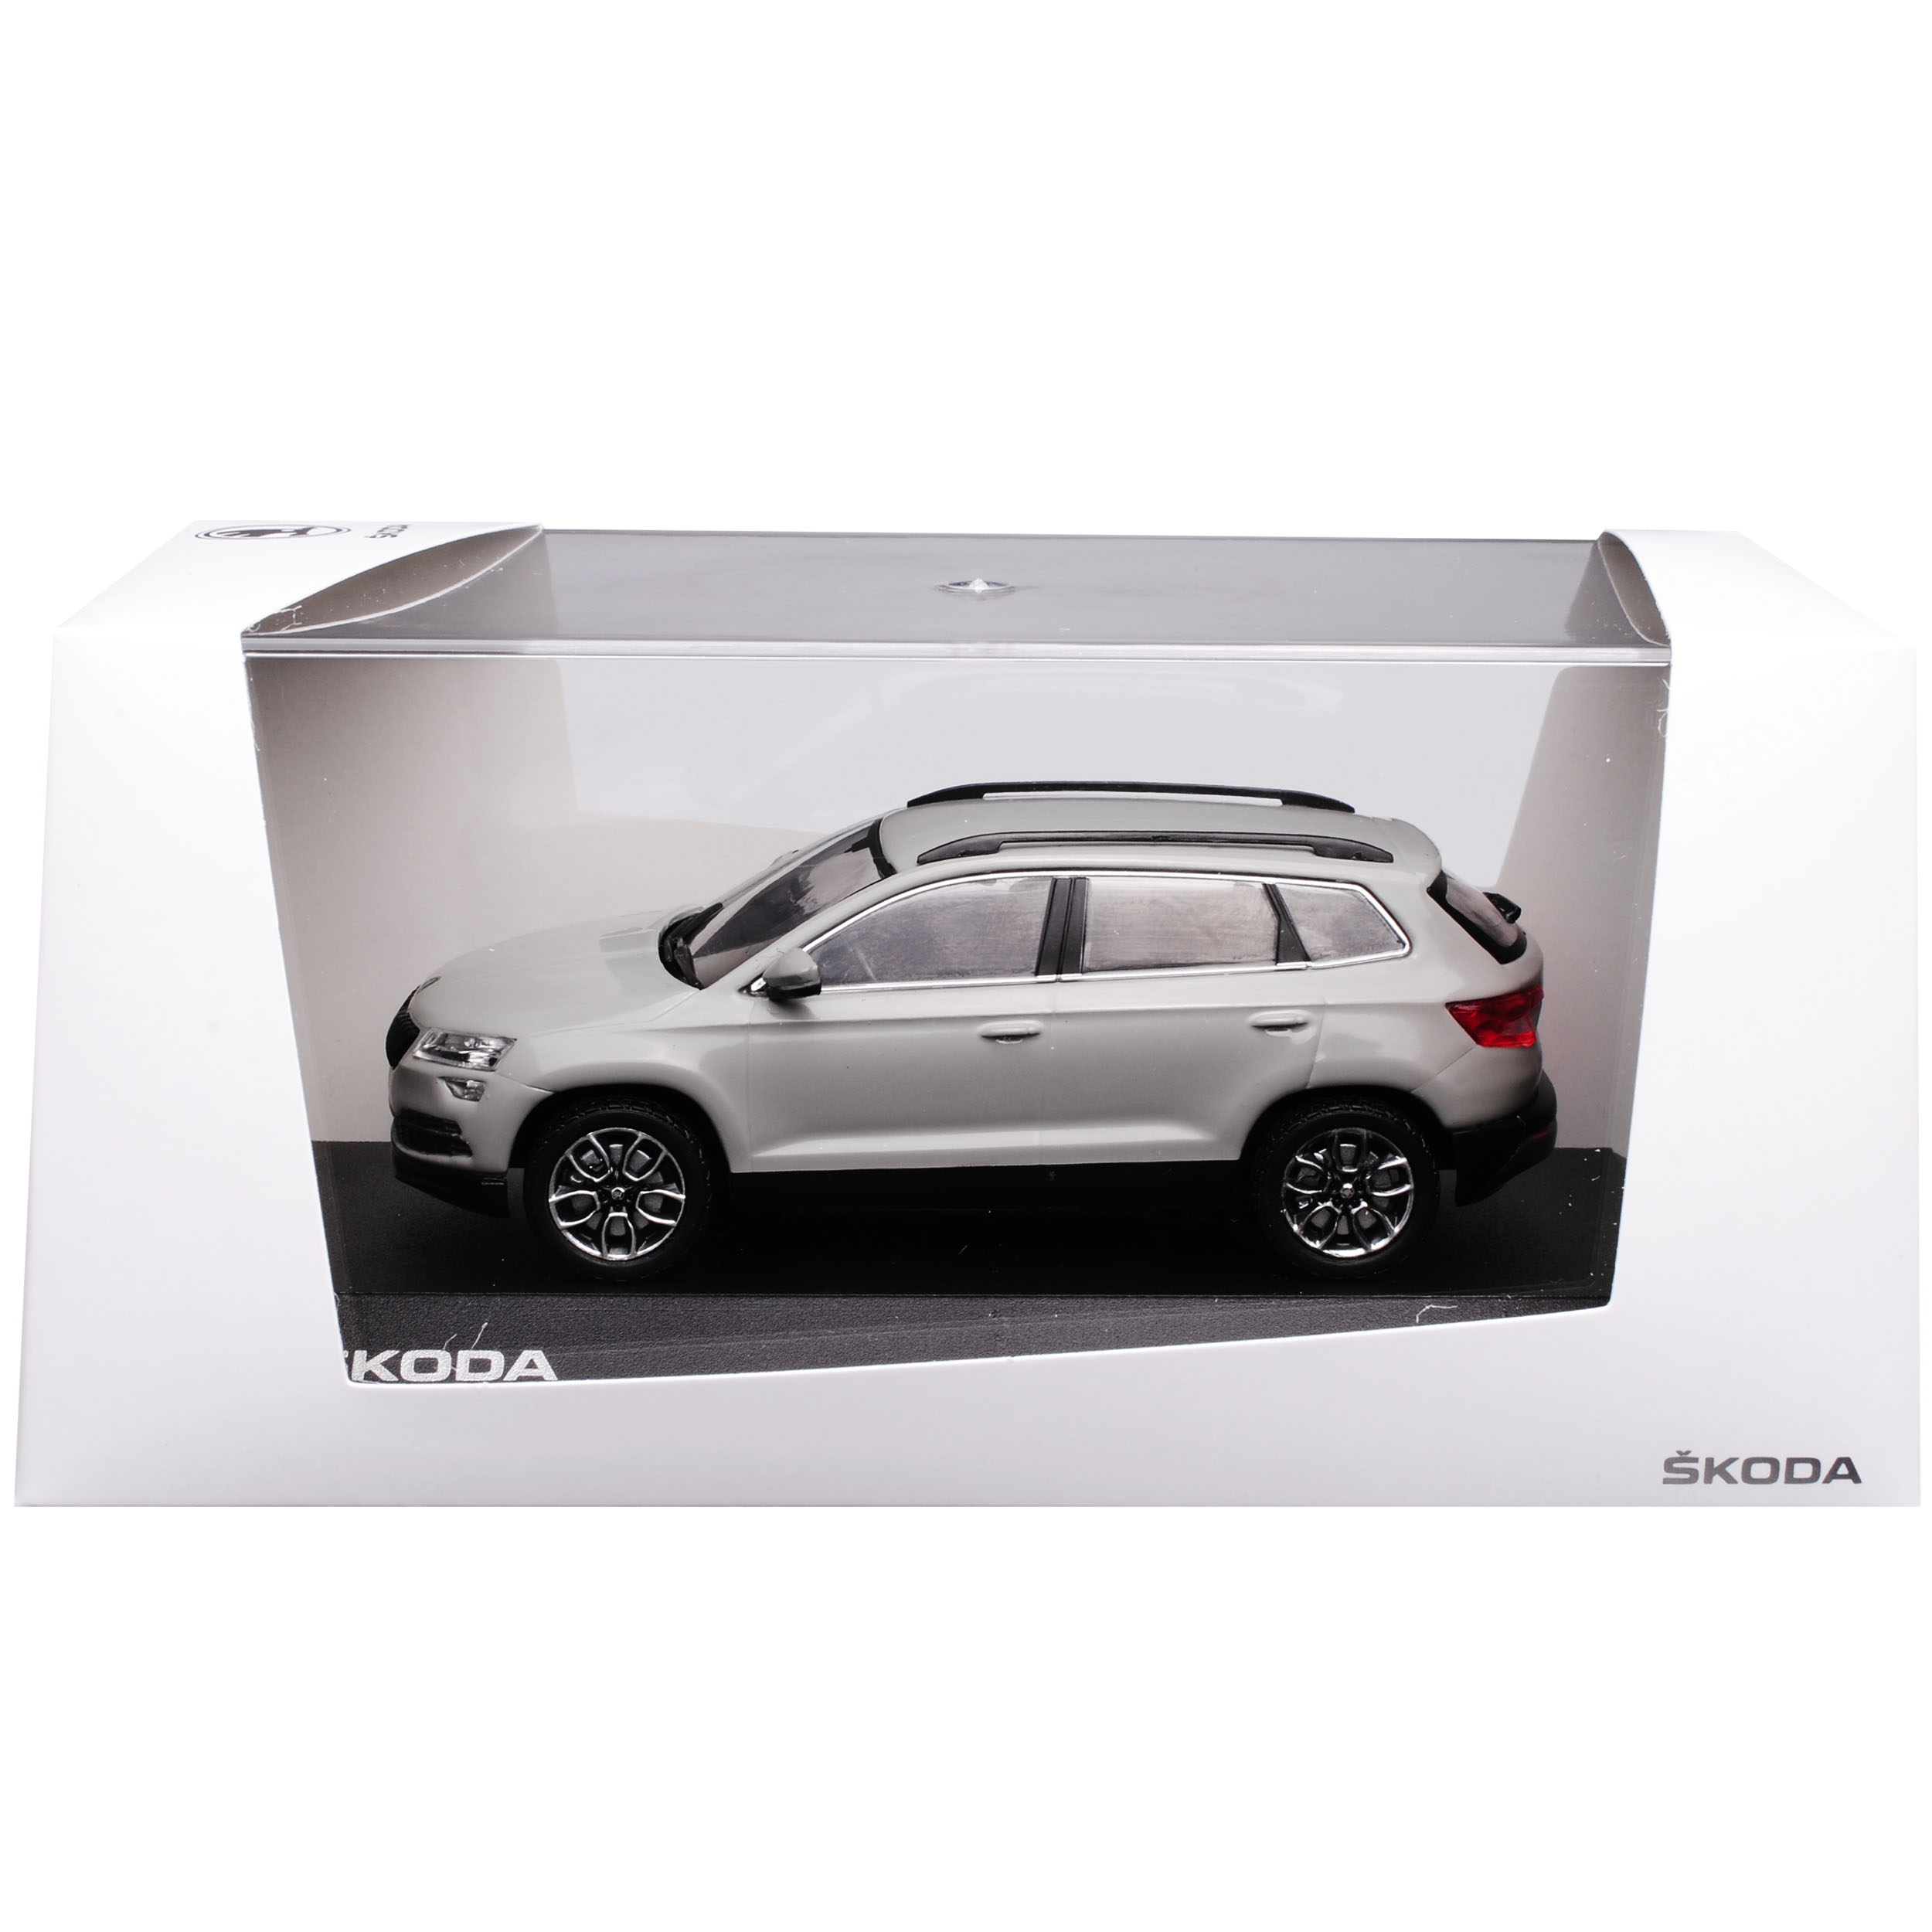 Skoda karoq SUV acero gris a partir de 2017 1//43 modelo Premiumx auto con o sin ind...